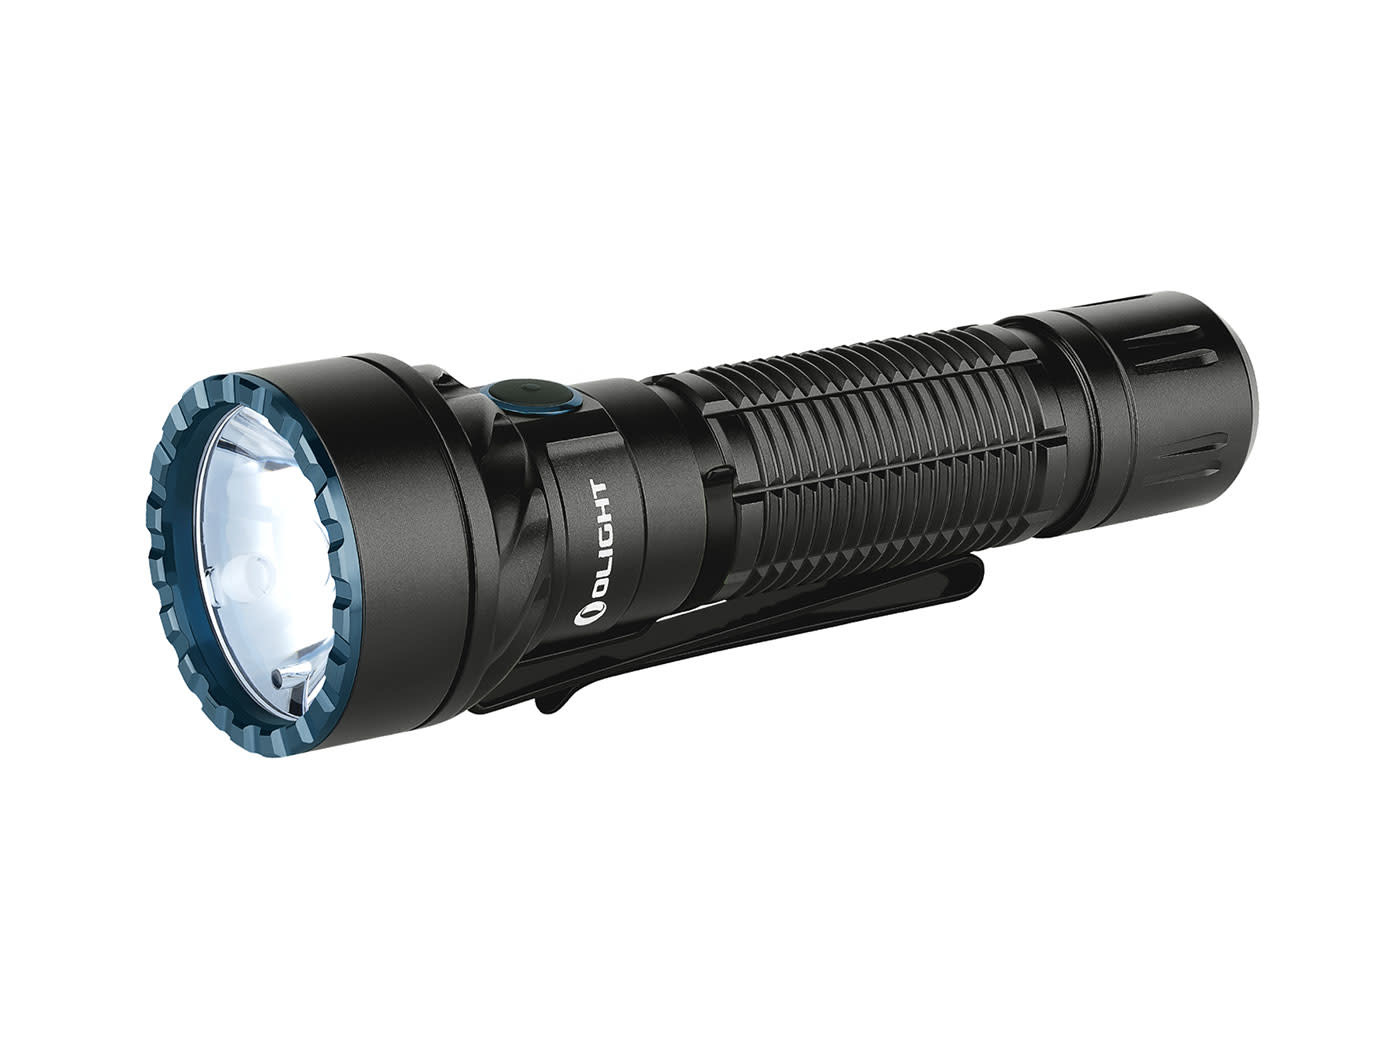 Freyr Multi-Color Tactical Light